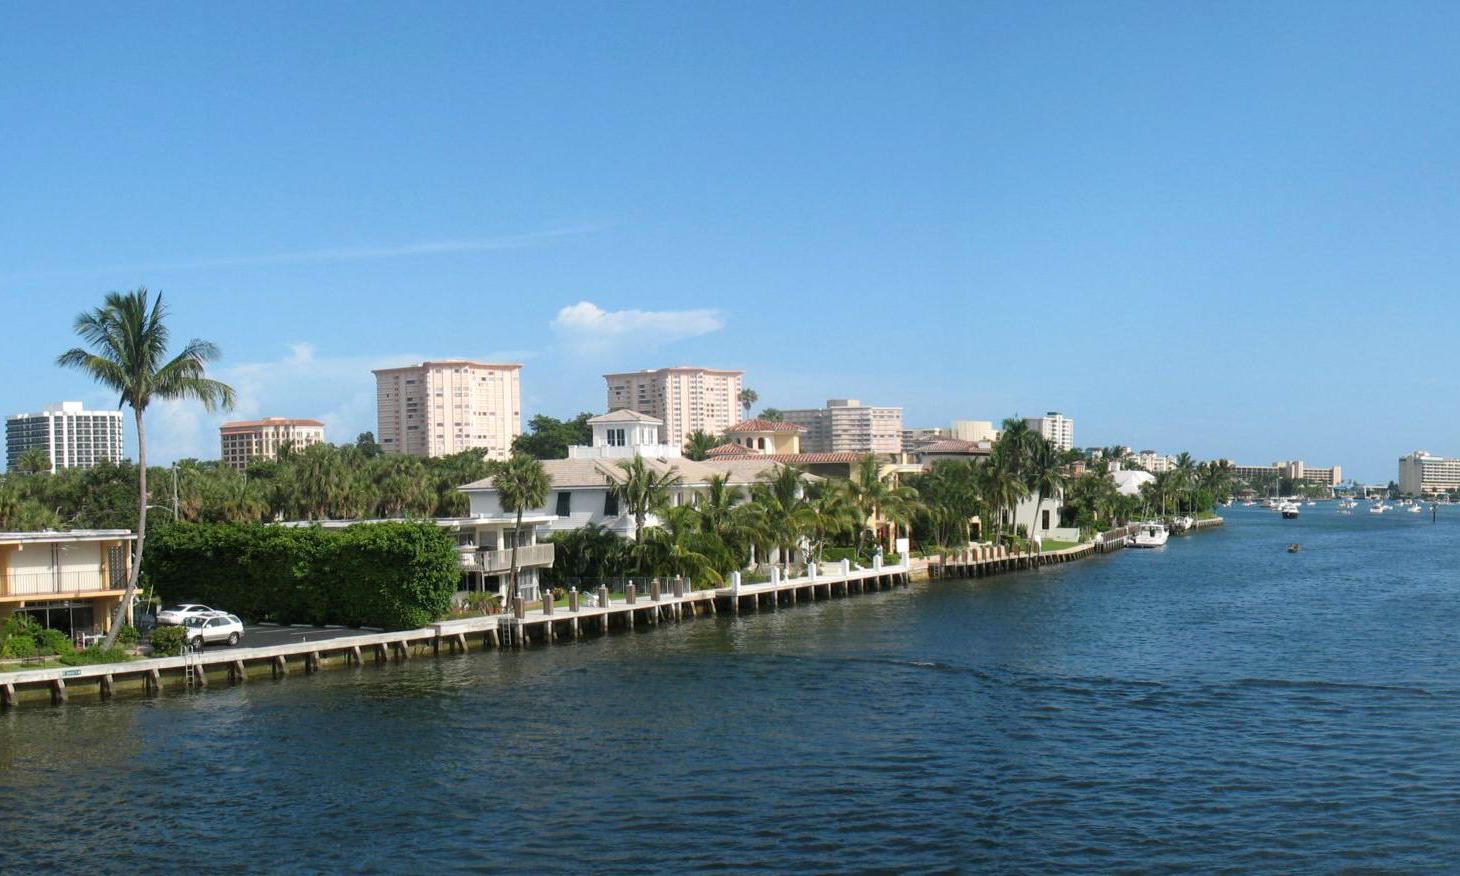 Neighborhoods in Boca Raton